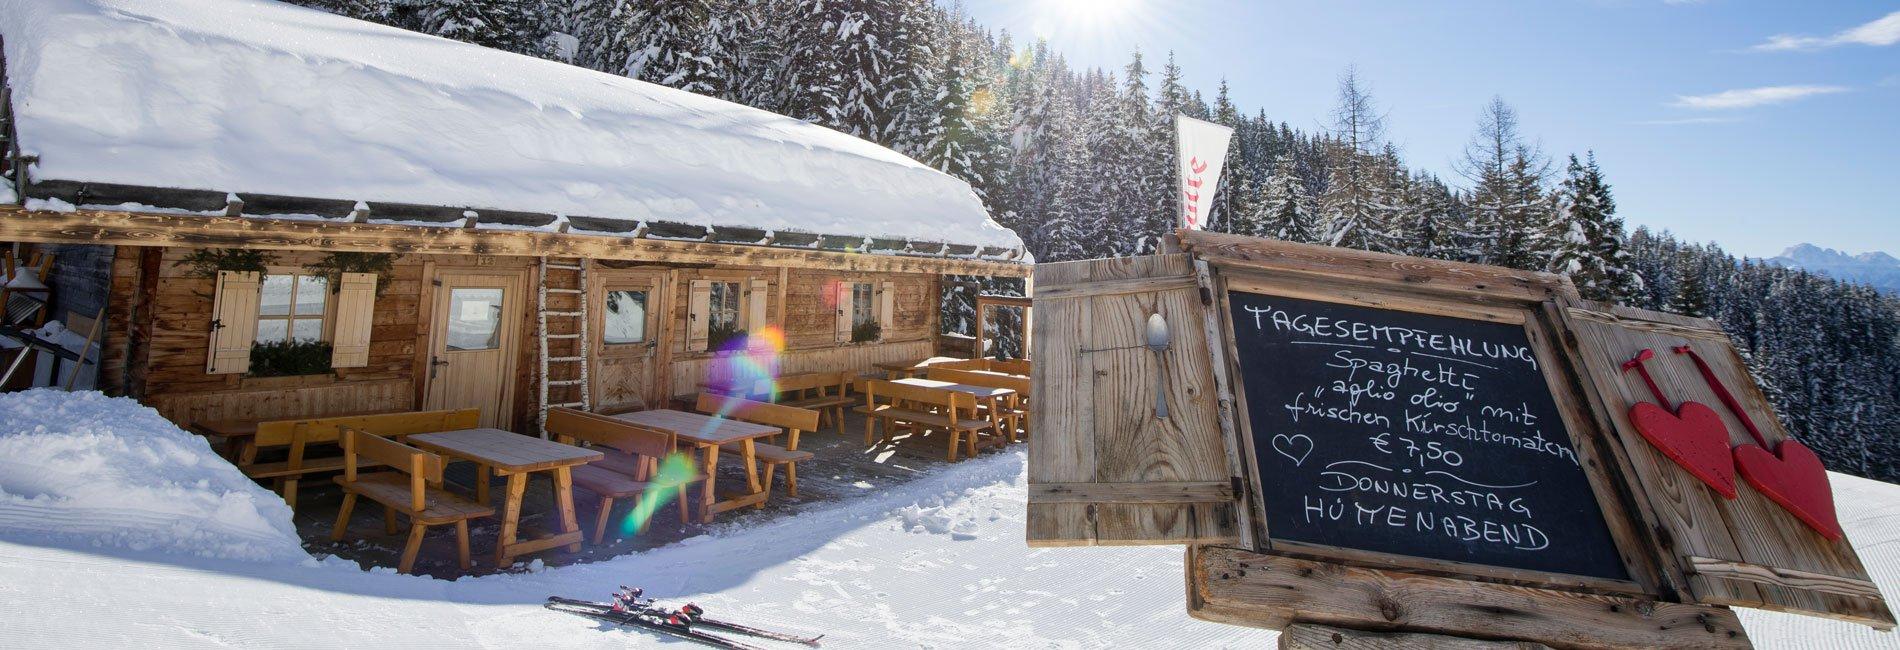 skiurlaub-meransen-18